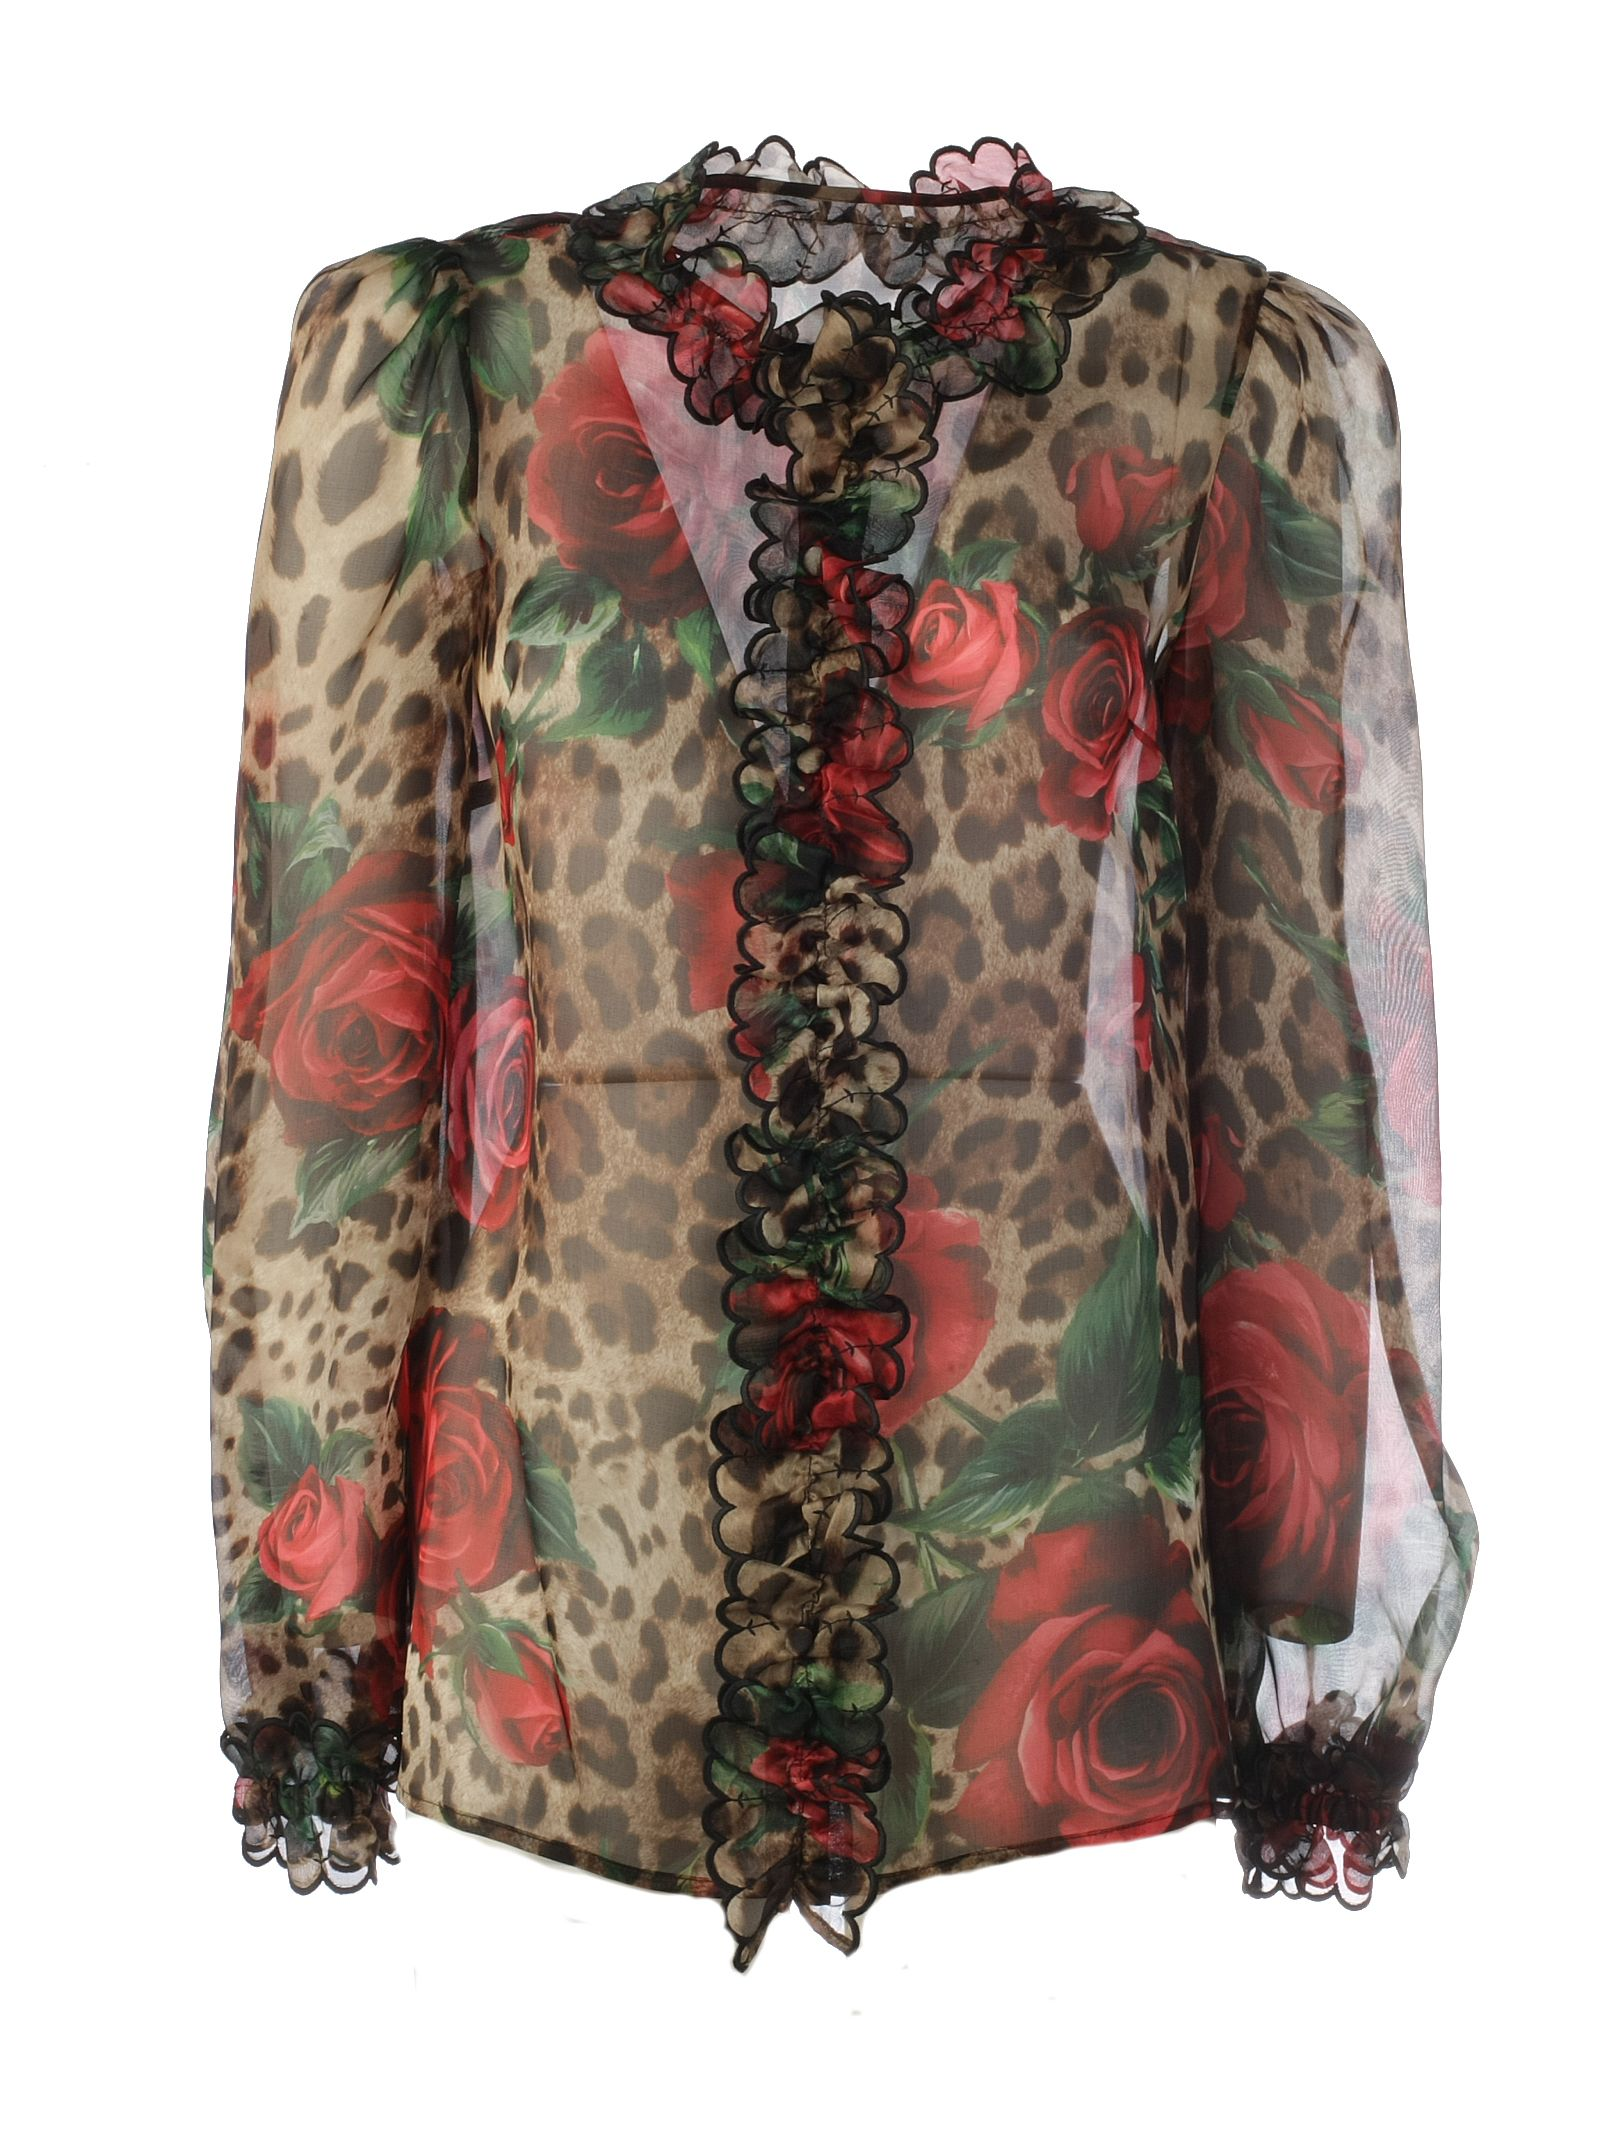 73a8368d20b Dolce & Gabbana Dolce & Gabbana Mixed-print Ruffled Blouse - Hkirs ...